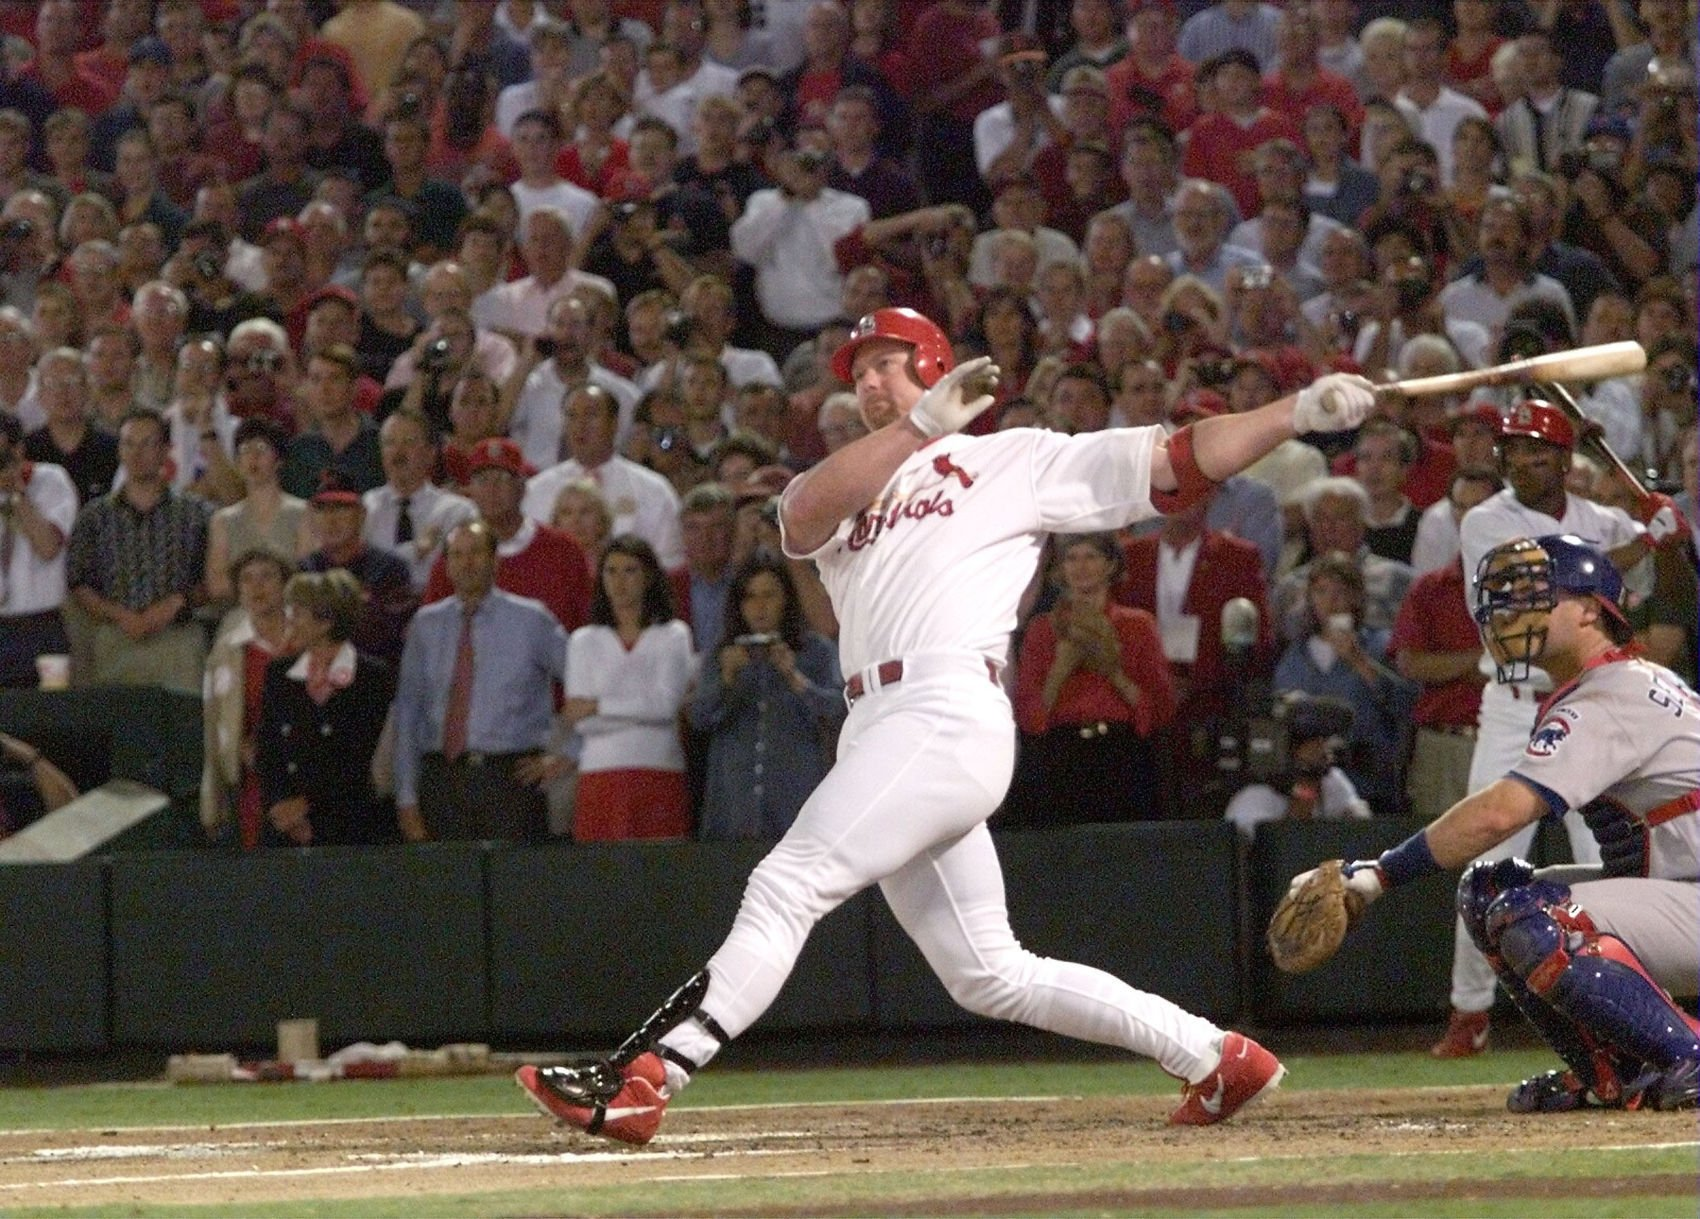 1999 Starting Lineup Mark McGwire Home Run Record Breaker Long Gone Summer